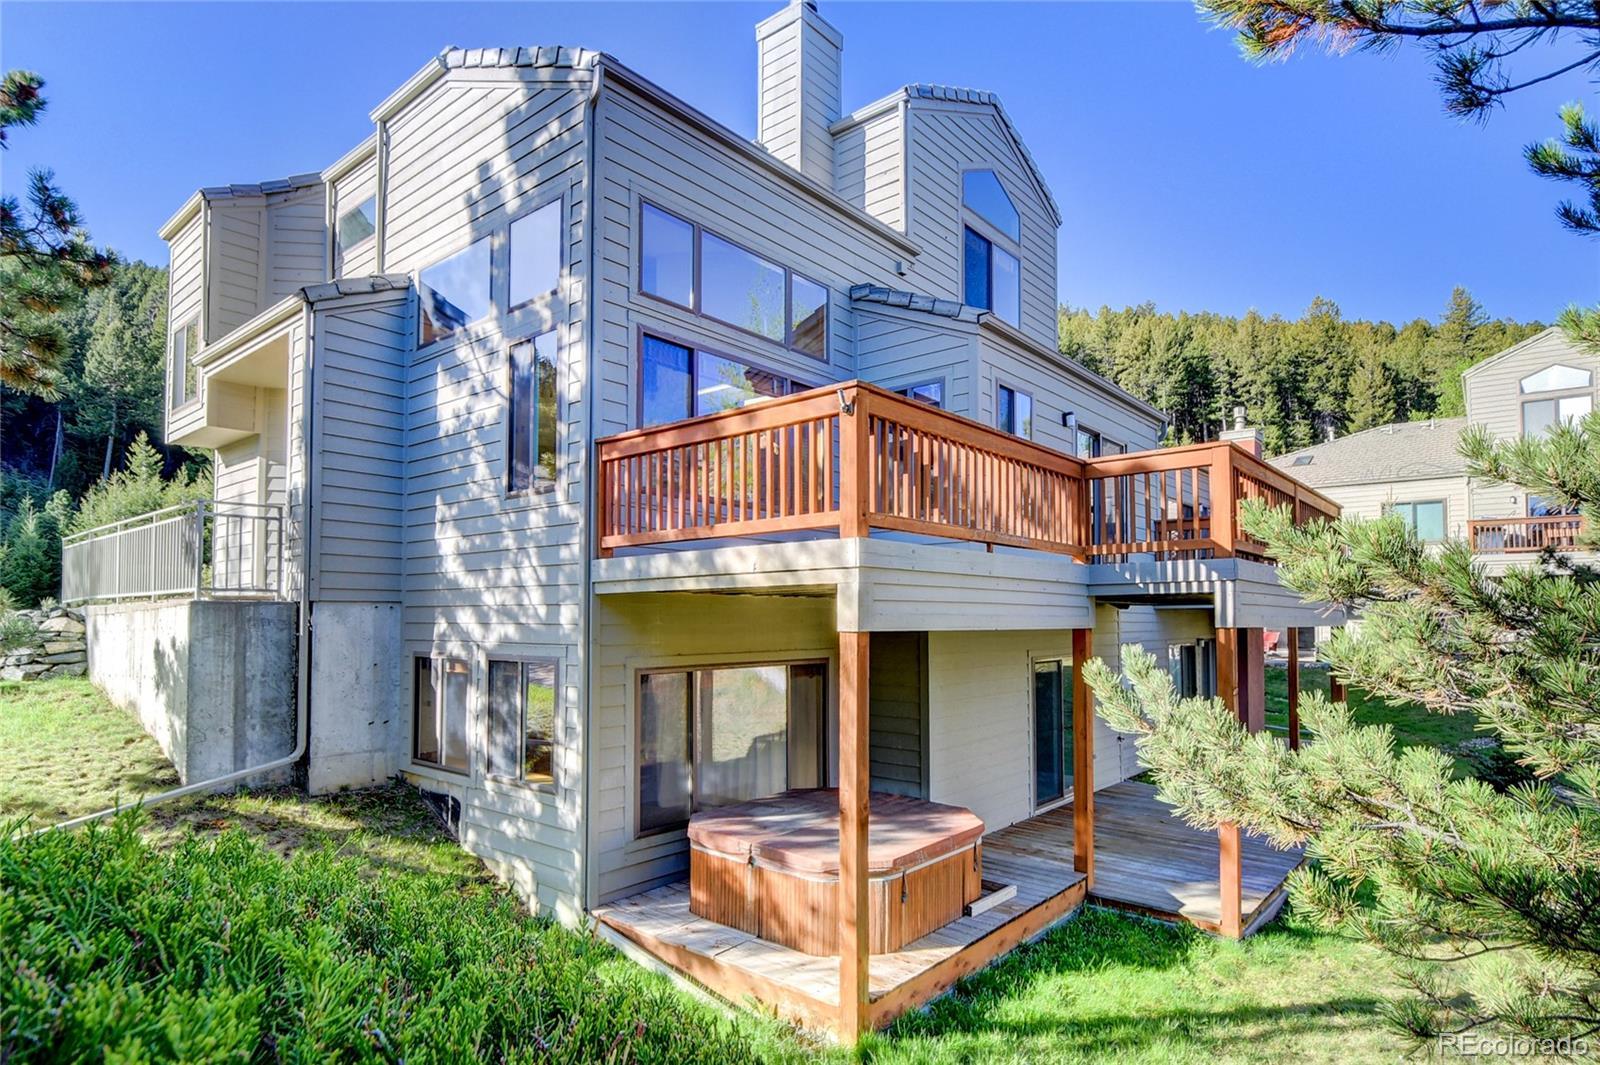 MLS# 2971781 - 1 - 784 Chimney Creek Drive #B, Golden, CO 80401